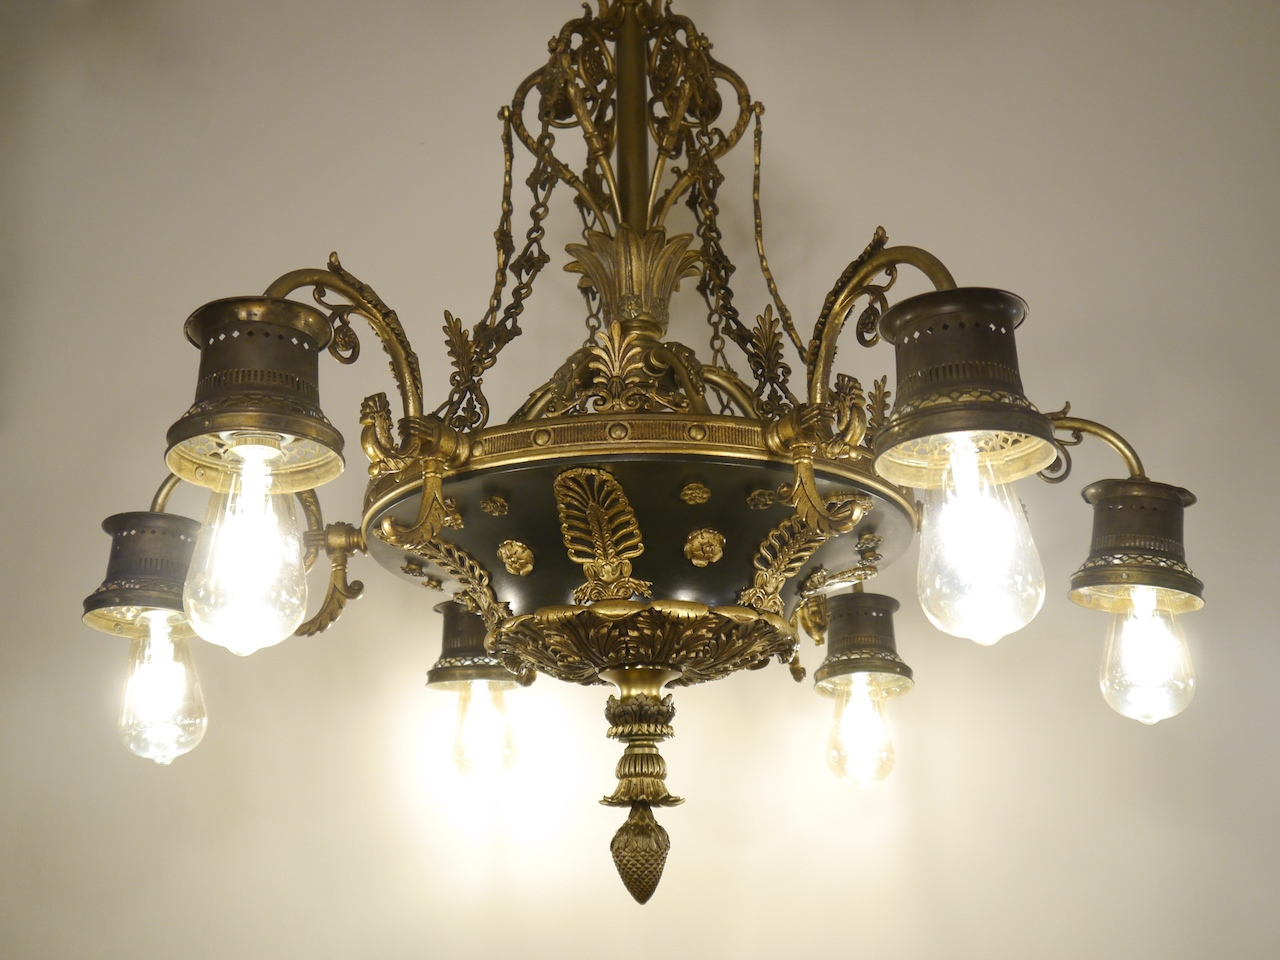 Kronleuchter 9 Flammig Kristall ~ Sac a perle sehr seltener hoher antiker empire kronleuchter lampe